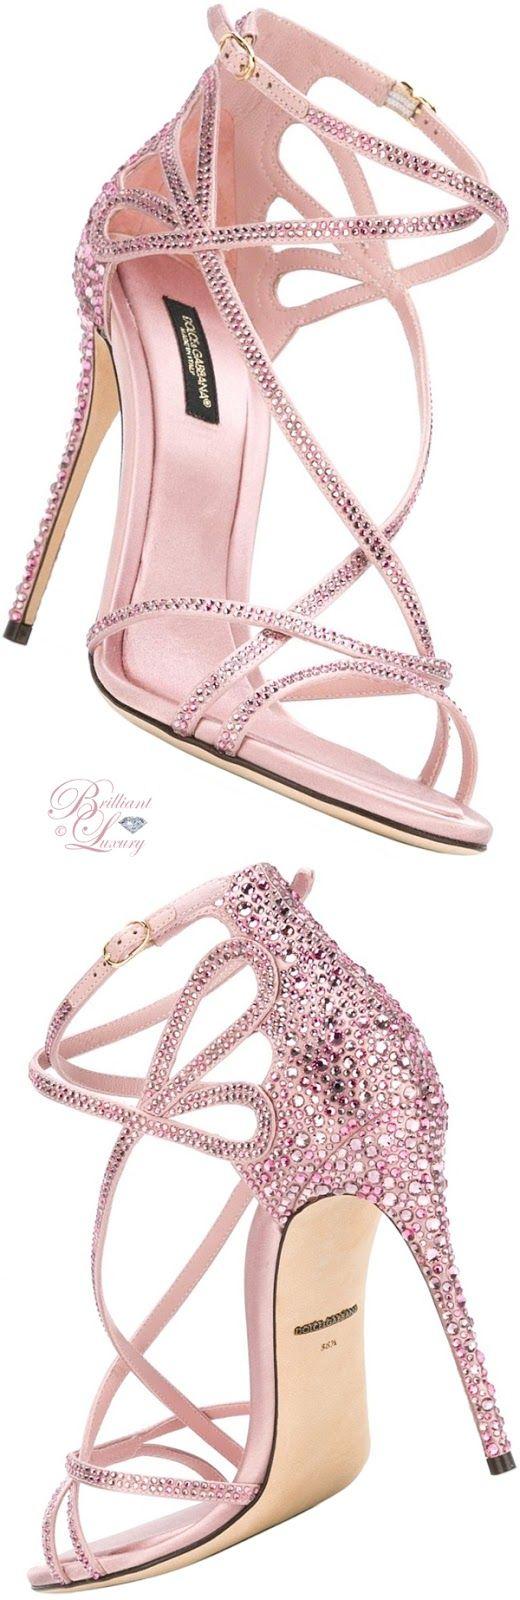 Brilliant Luxury by Emmy DE ♦ Dolce & Gabbana Keira Sandals